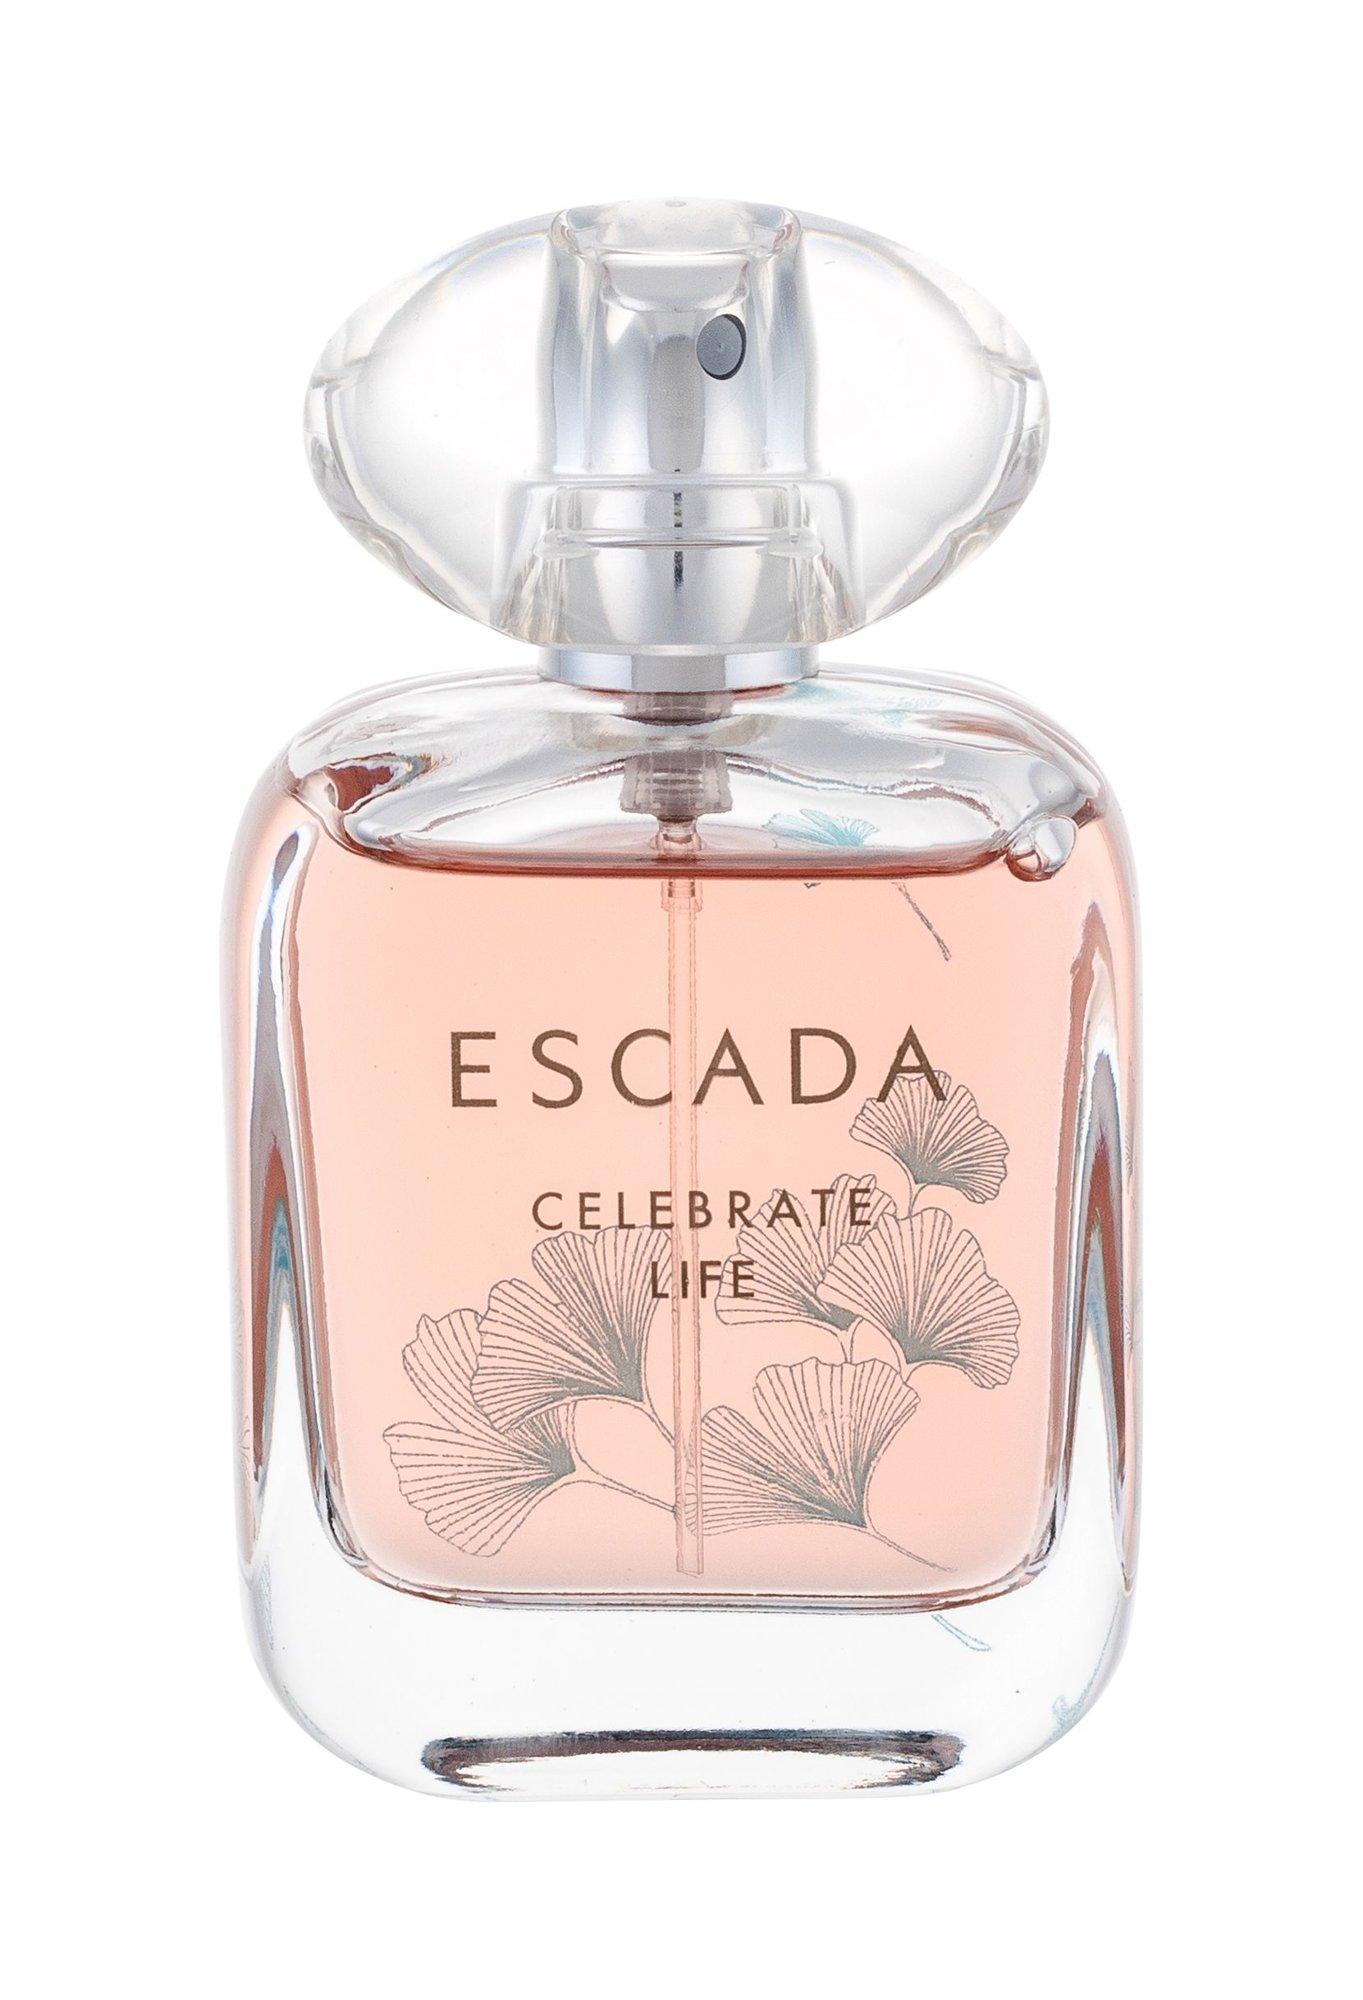 ESCADA Celebrate Life Eau de Parfum 50ml